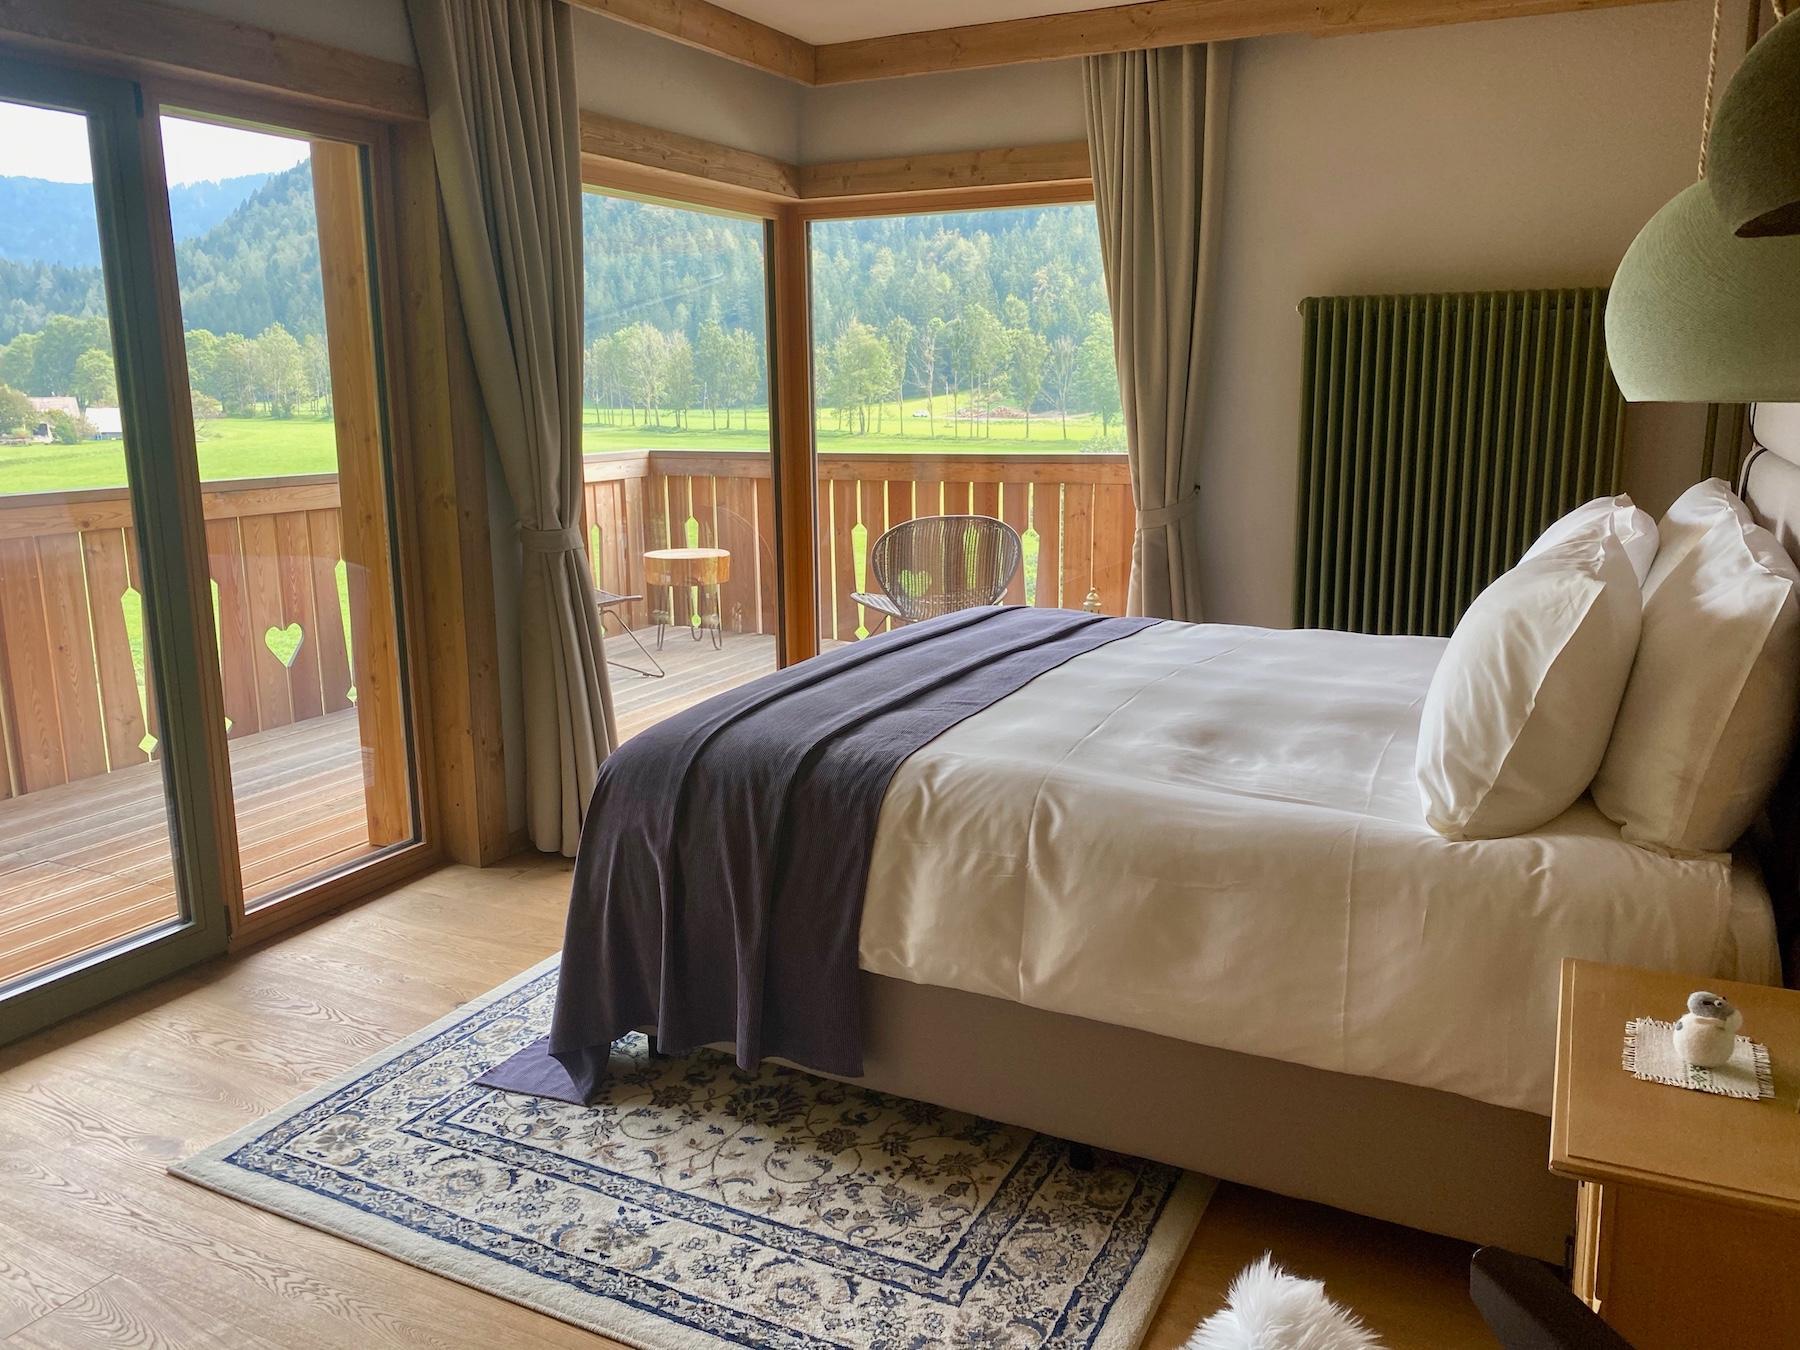 Breakthrough Business Retreat, Vila Planinka Rooms, Slovenia, Planet Peacock